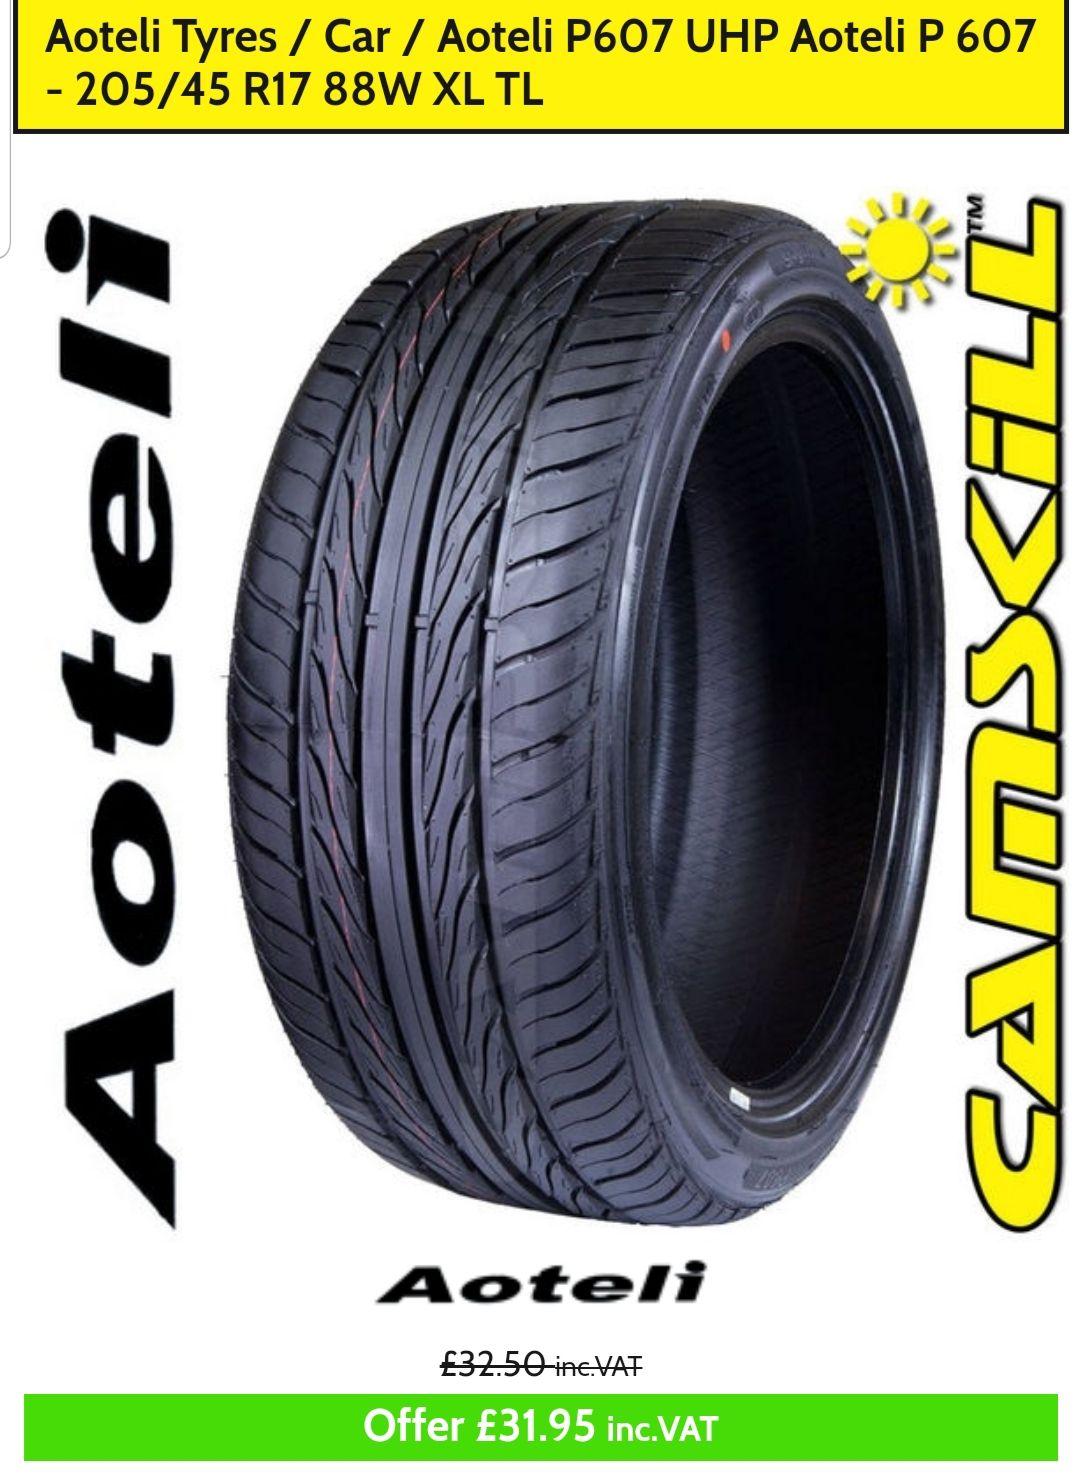 3647227a785 Aoteli P607 Tyres - £31.95   CamSkill Performance